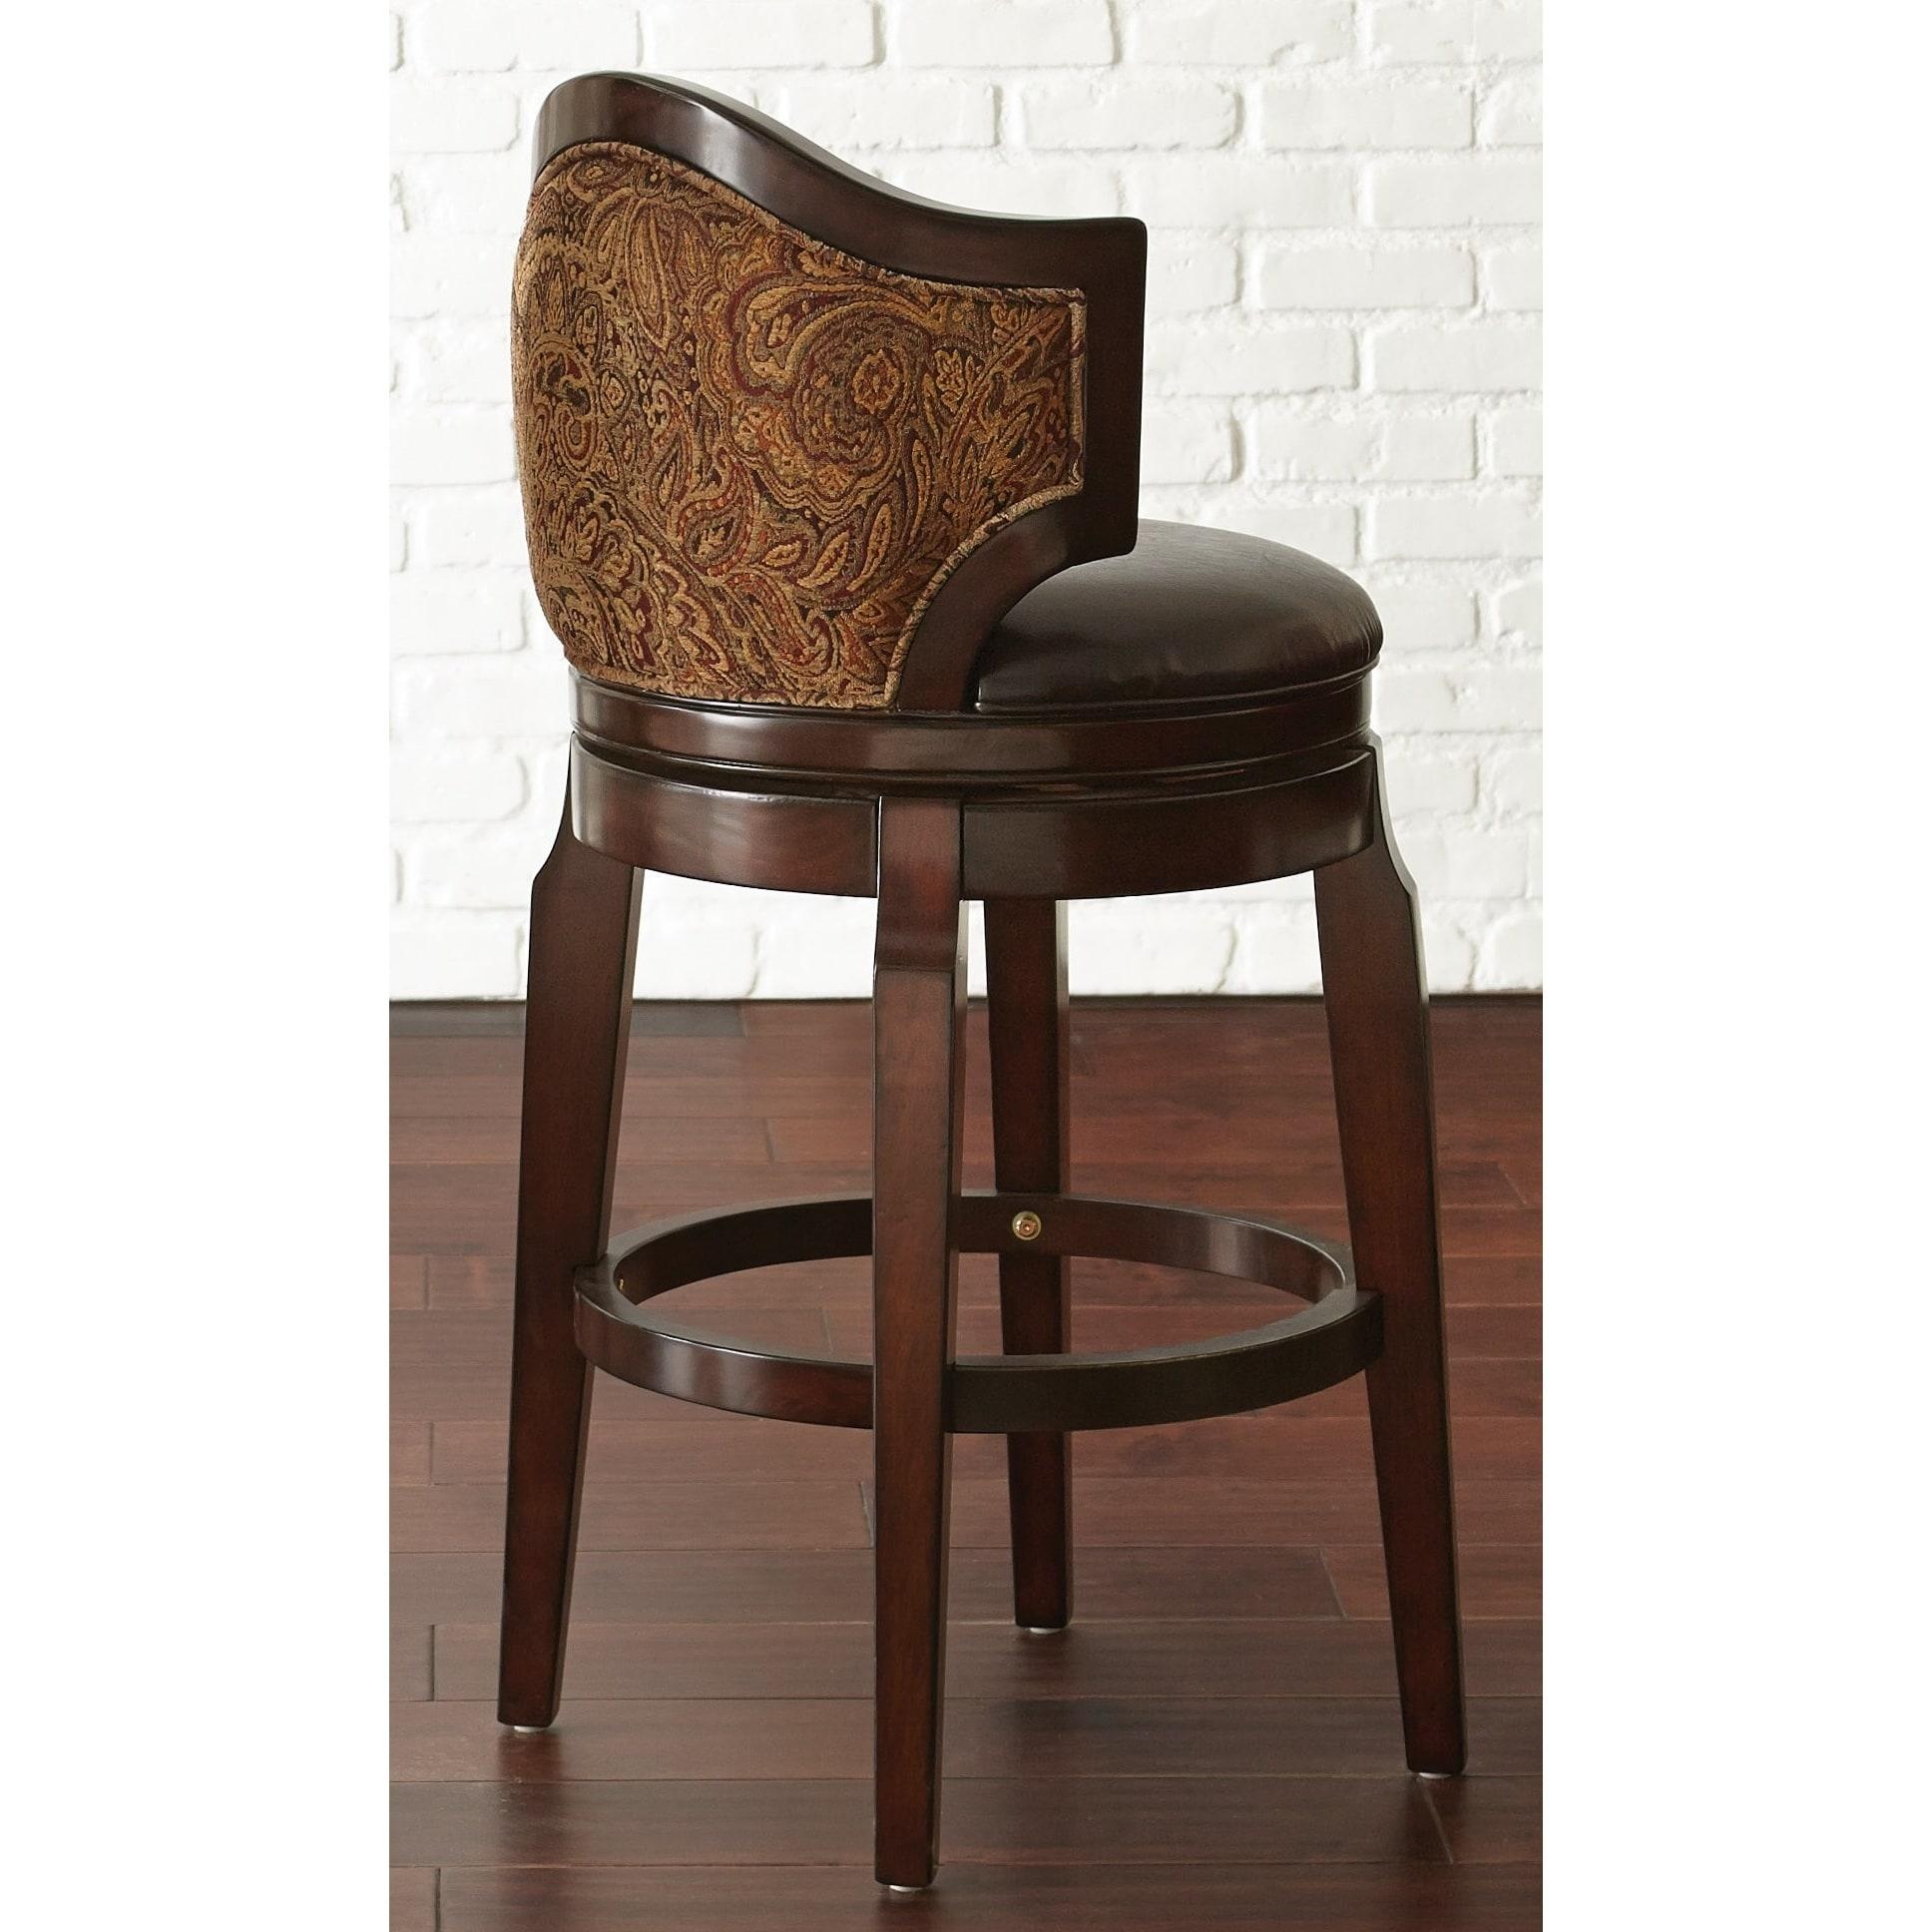 fleur de lis bar stools. Jensen 30-inch Low Back Bar Stool By Greyson Living (Set Of 2) - Free Shipping Today Overstock 17689047 Fleur De Lis Stools